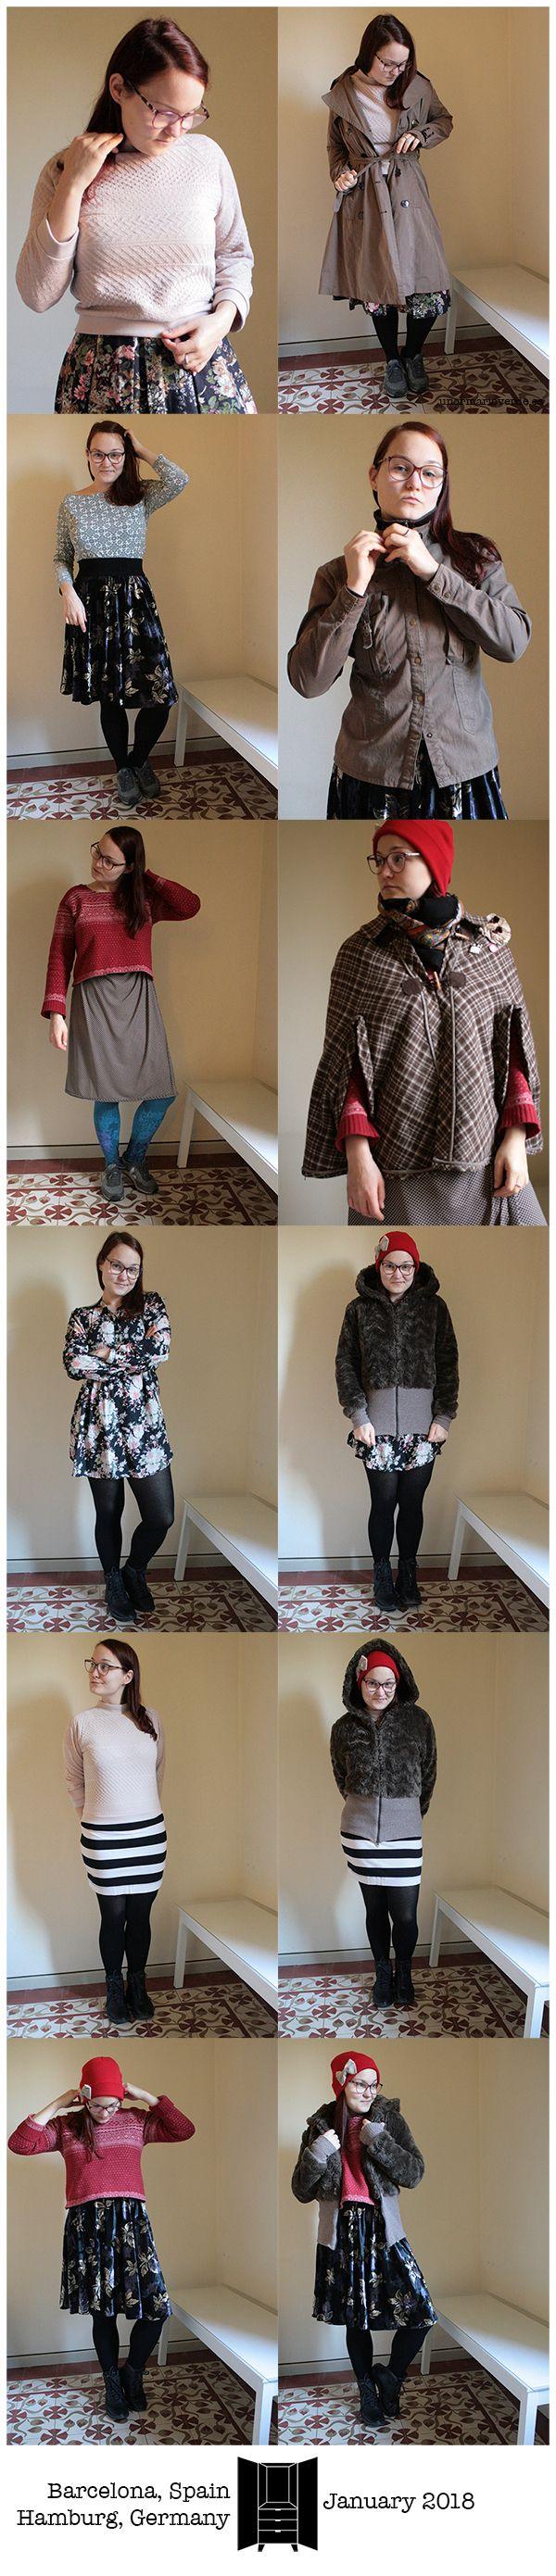 unarmarioverde.es - Winter 2018 capsule wardrobe outfits - January 2018 - Barcelona, Spain & Hamburg, Germany